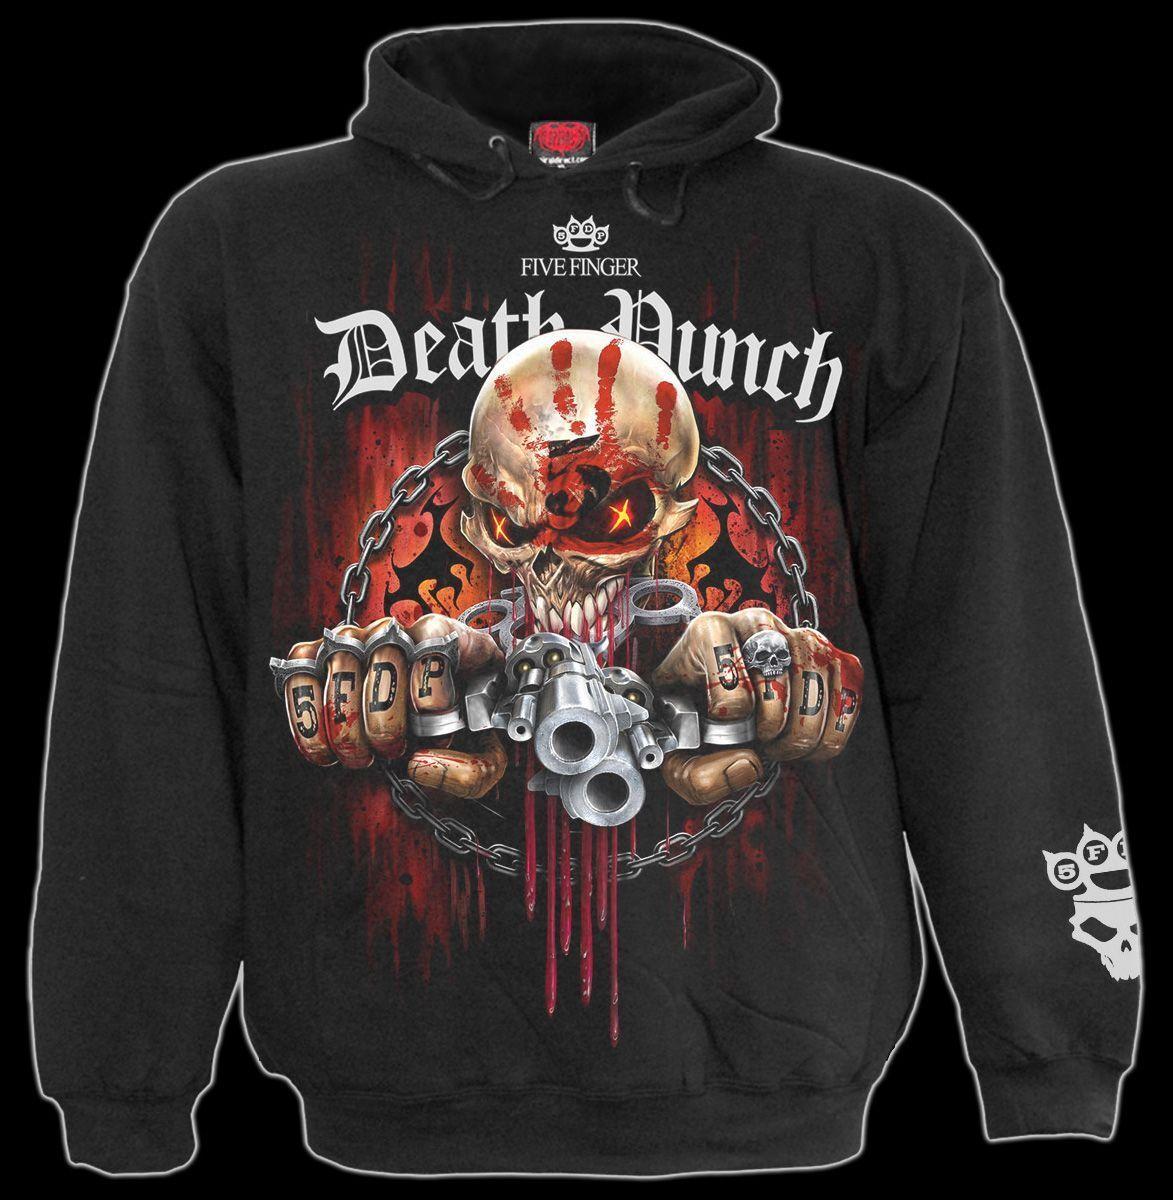 Five Finger Death Punch Kapuzenpullover - 5FDP Assassin - Spiral Gothic Herren